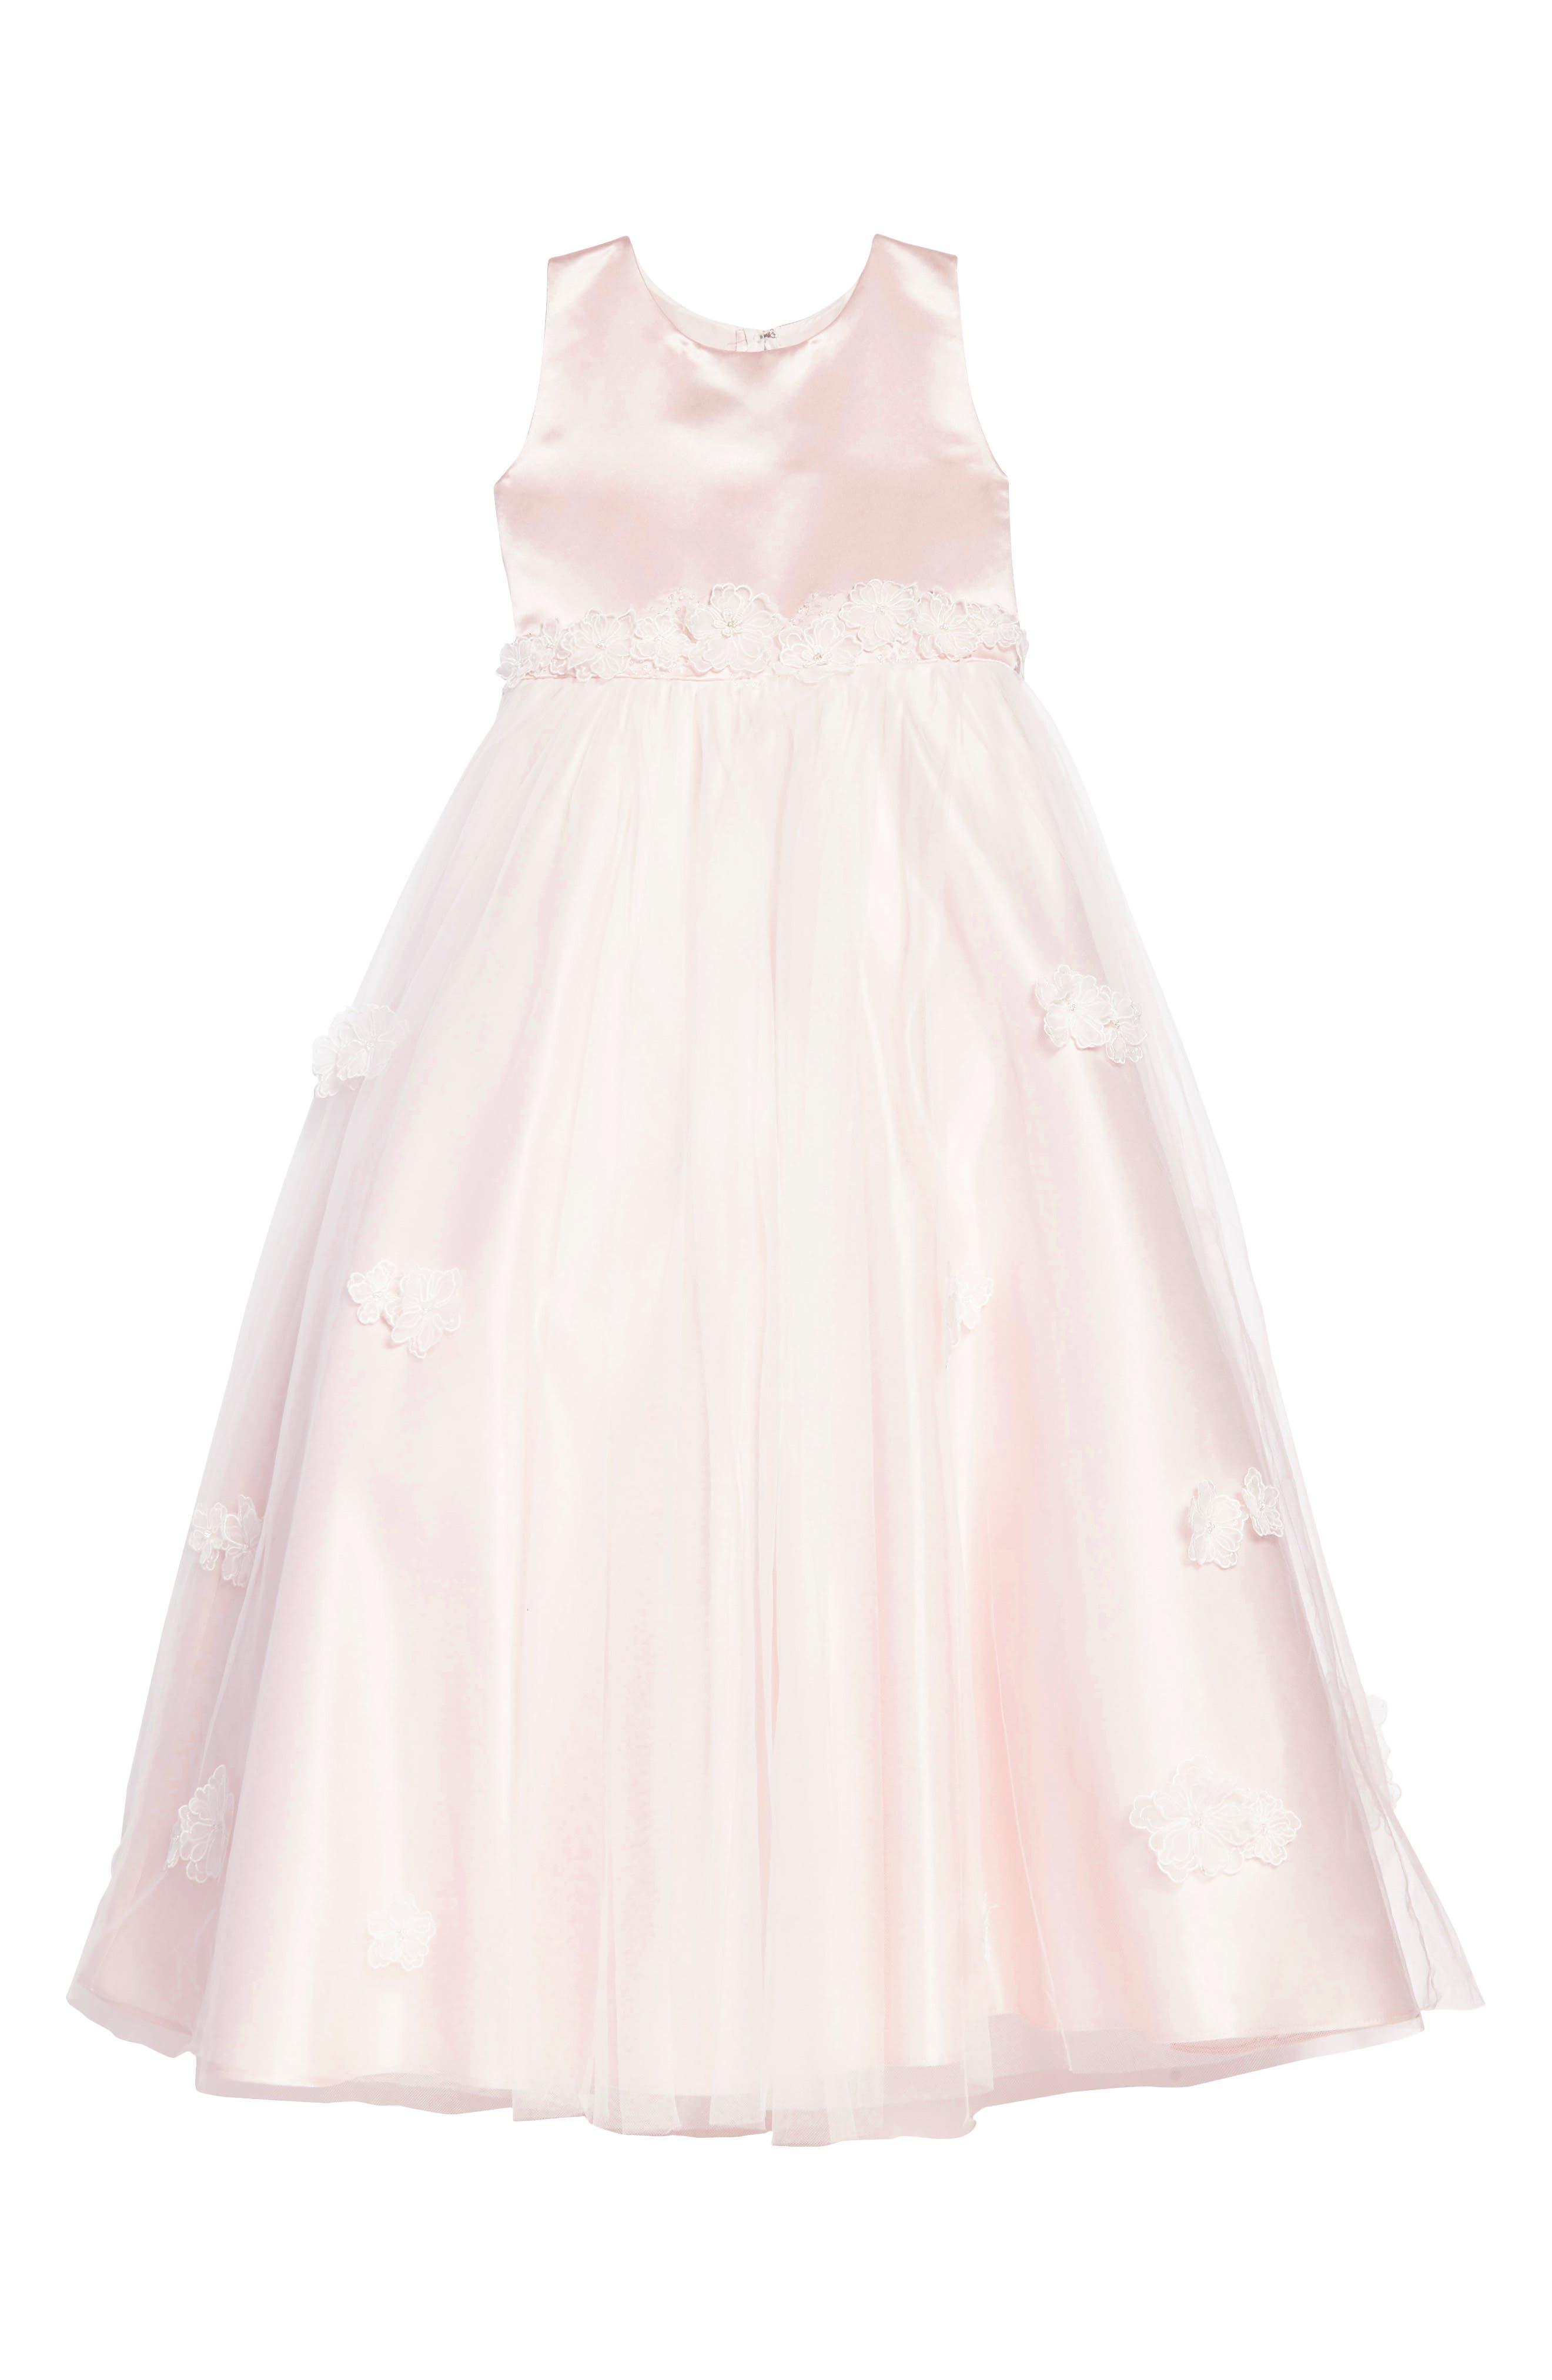 Satin & Tulle Dress,                         Main,                         color, Petal/ Ivory